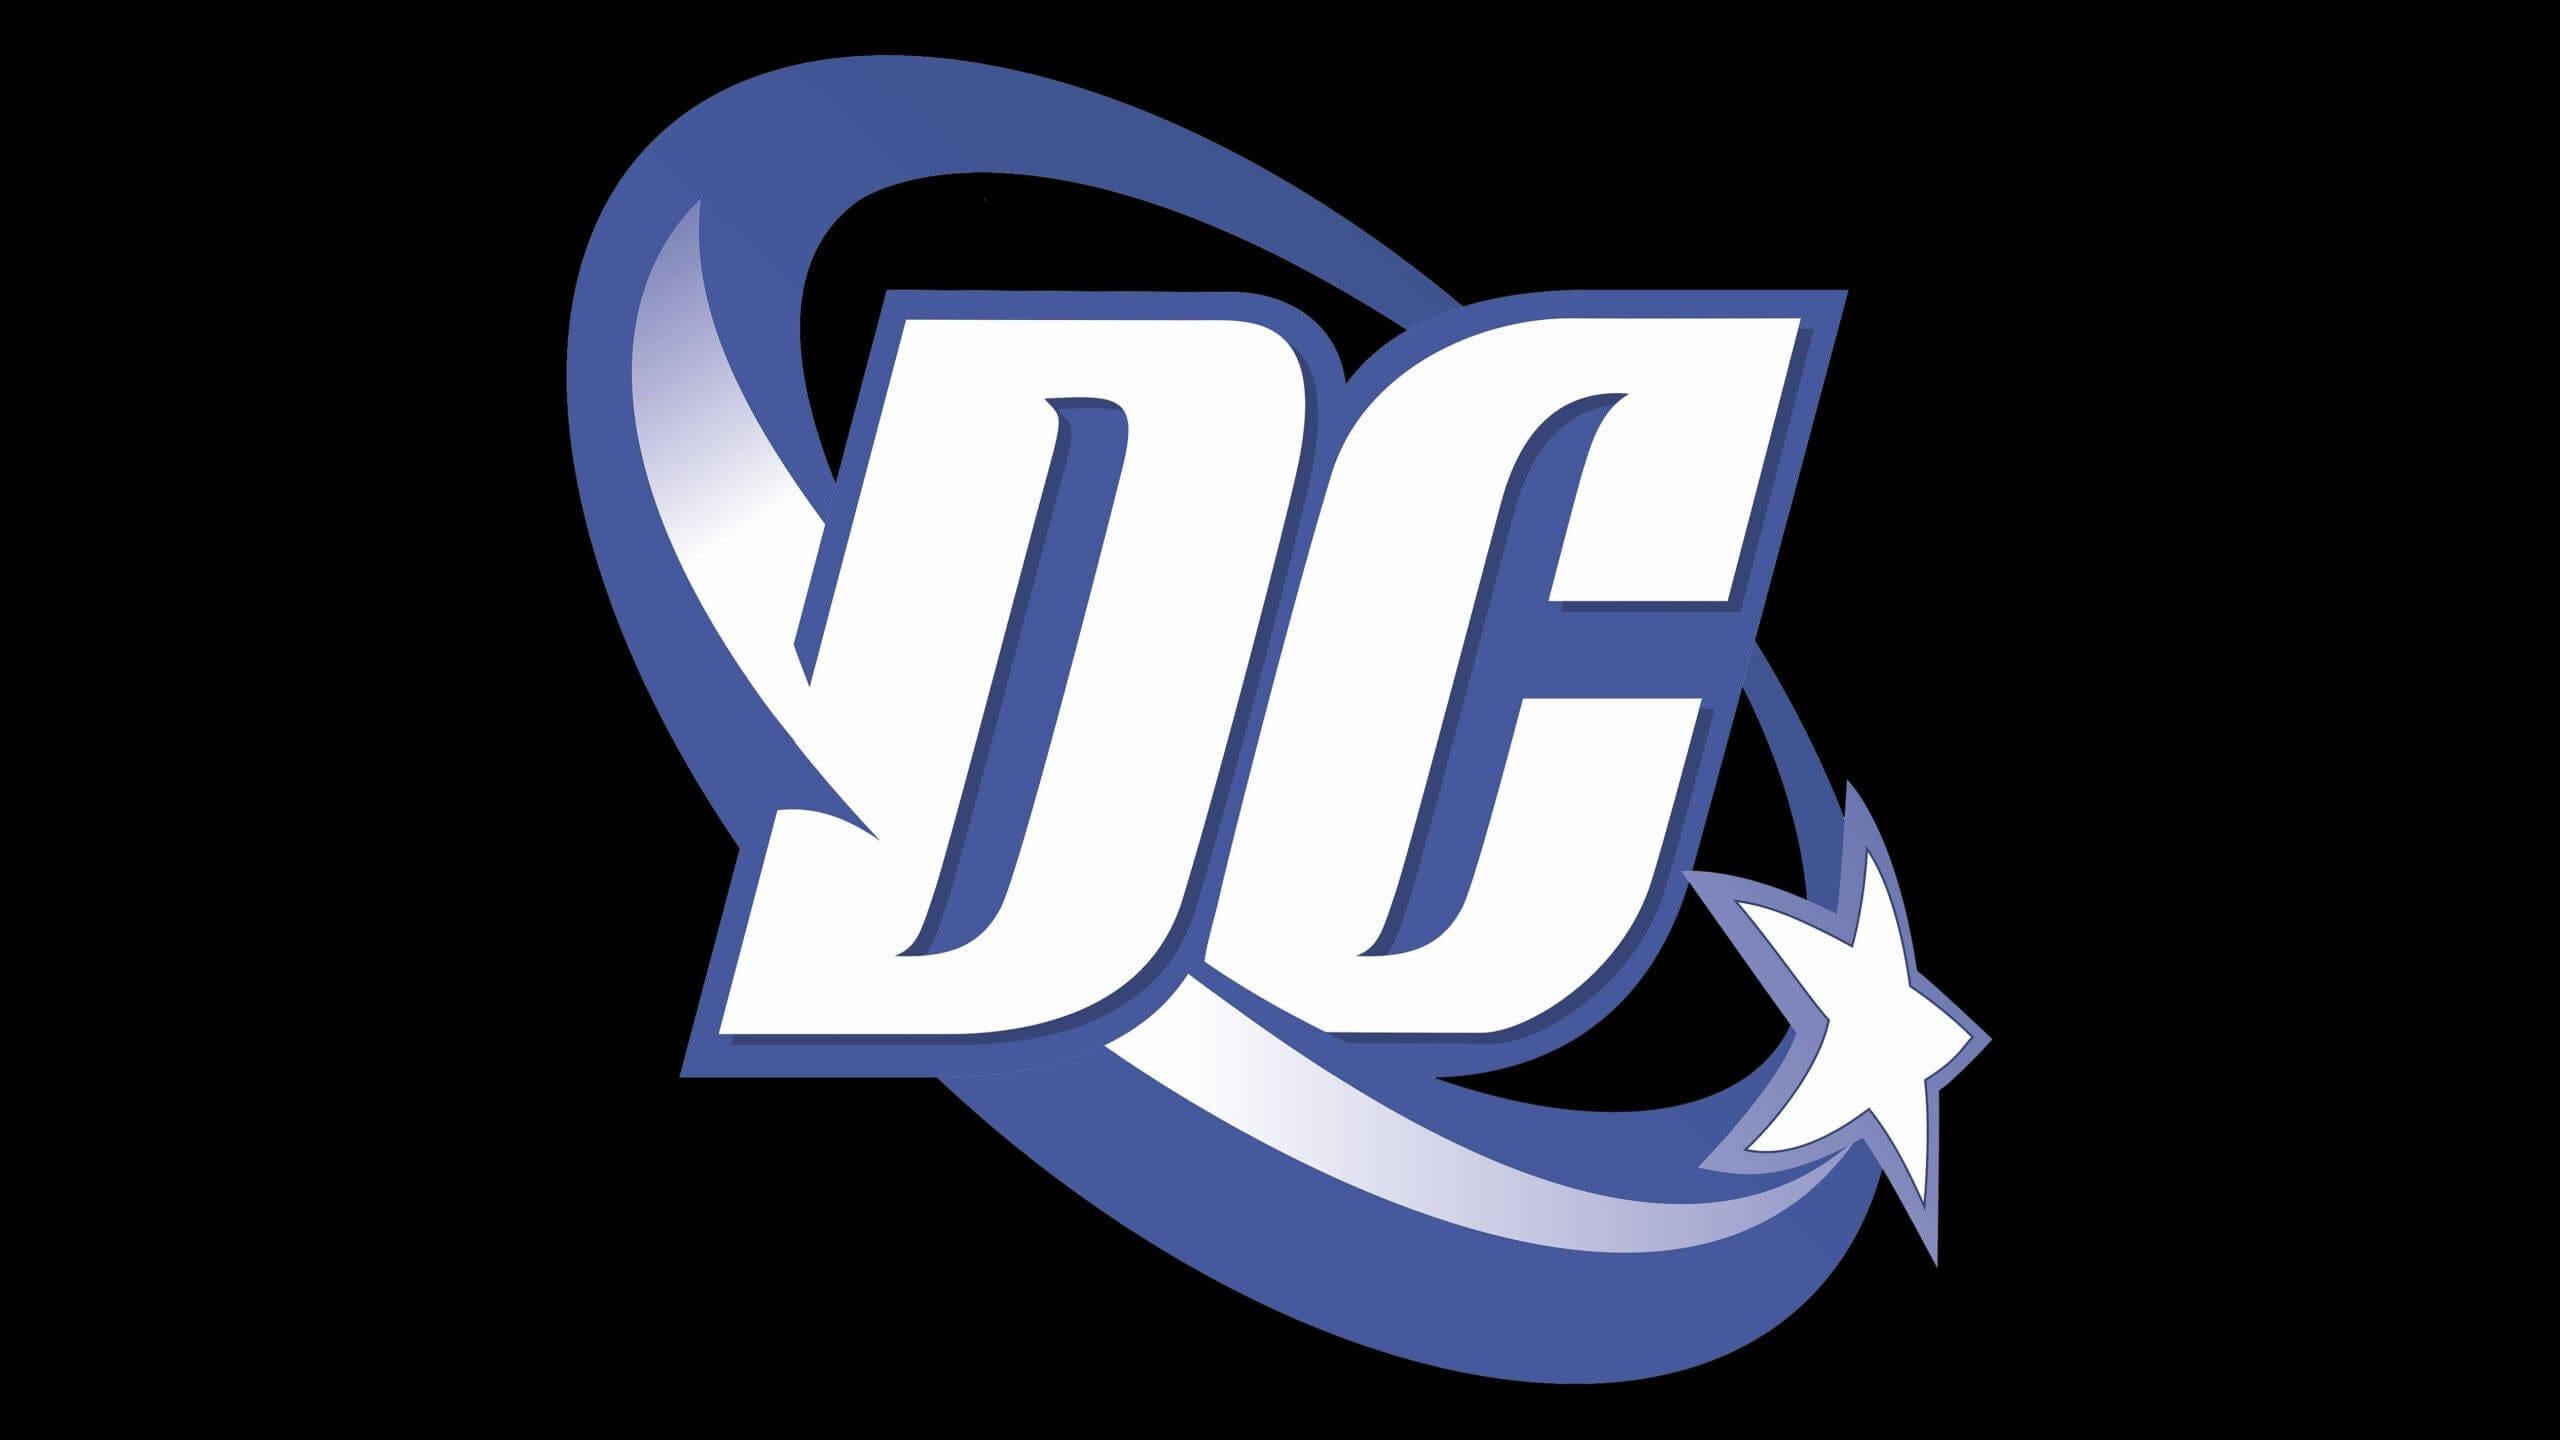 Dan DiDio, DC Comics